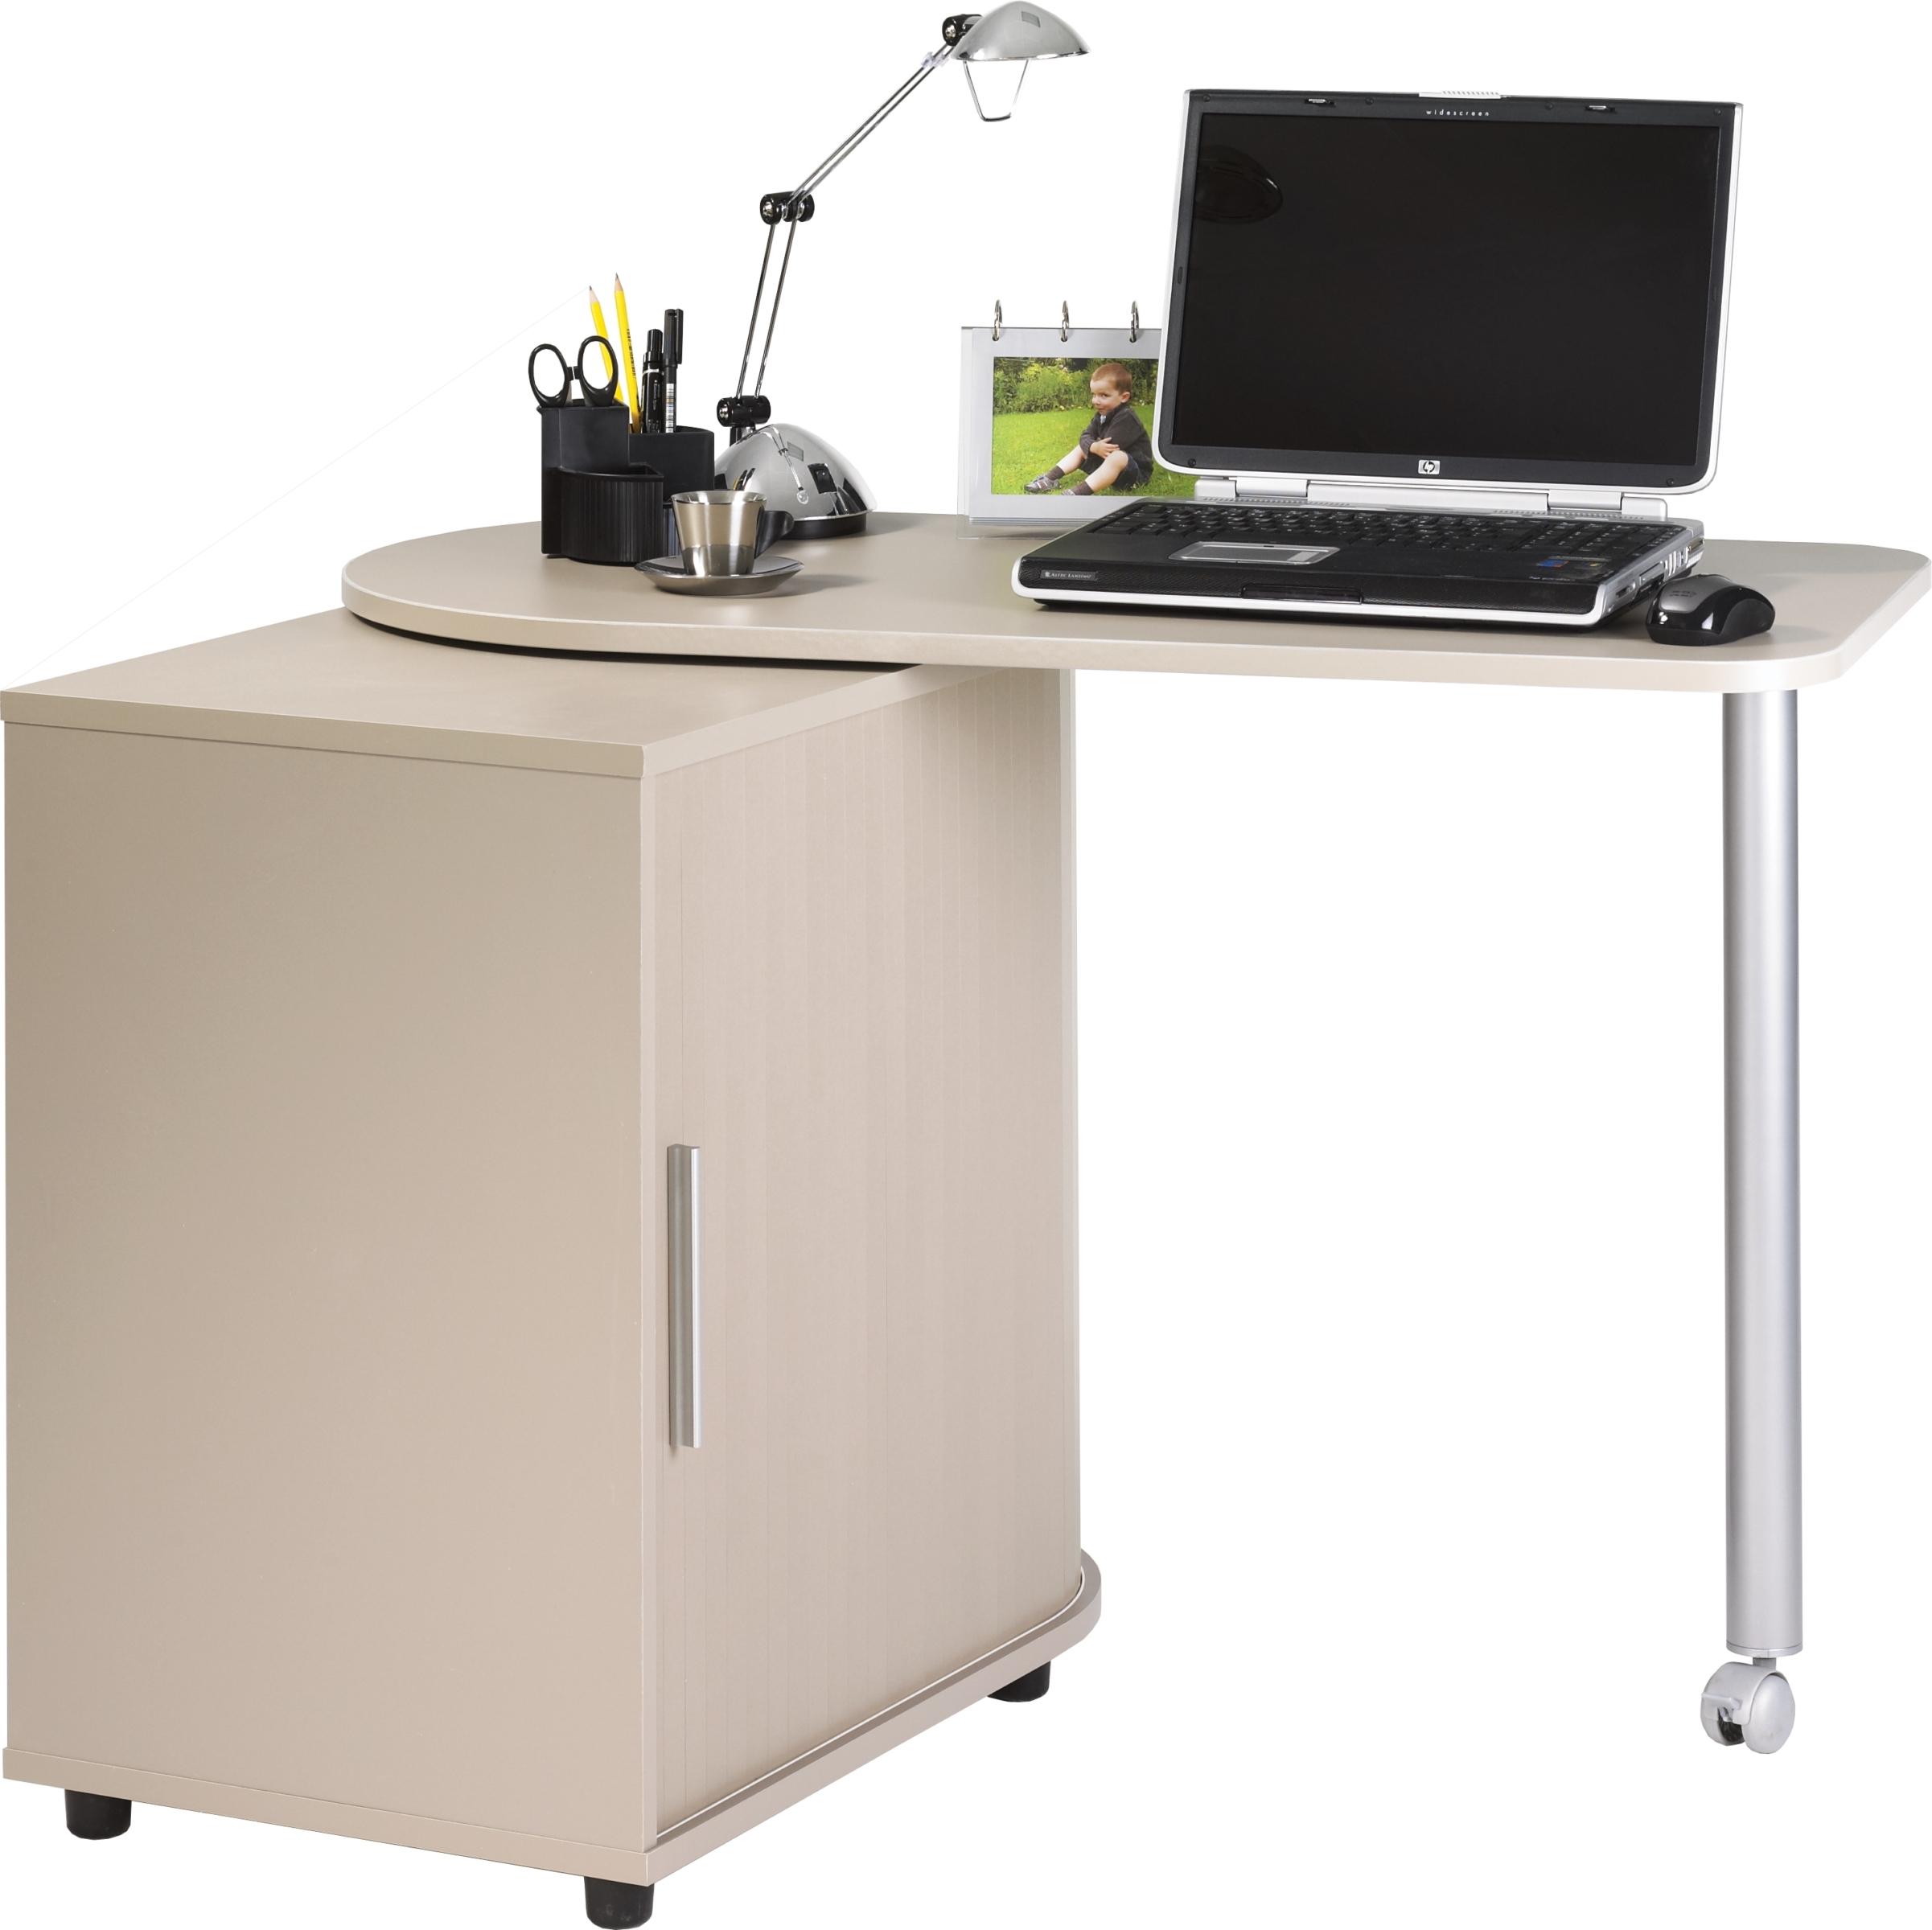 Fauteuil de bureau pivotant en bois - Bureau ordinateur design ...